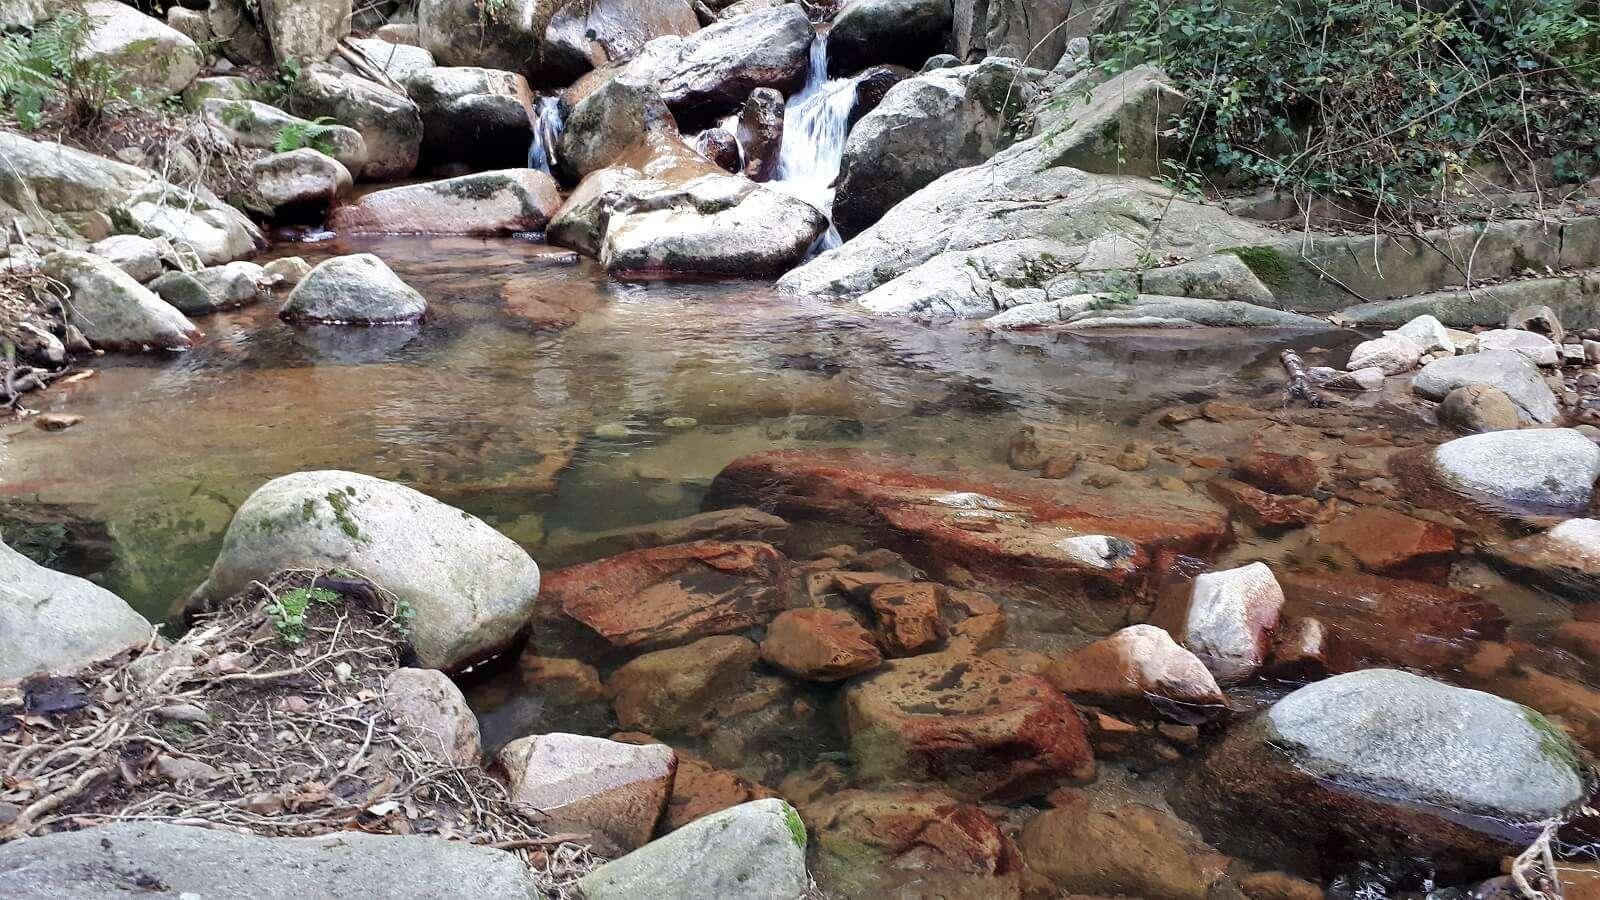 1600 riells selva montseny 2020-08-02_15-44-26